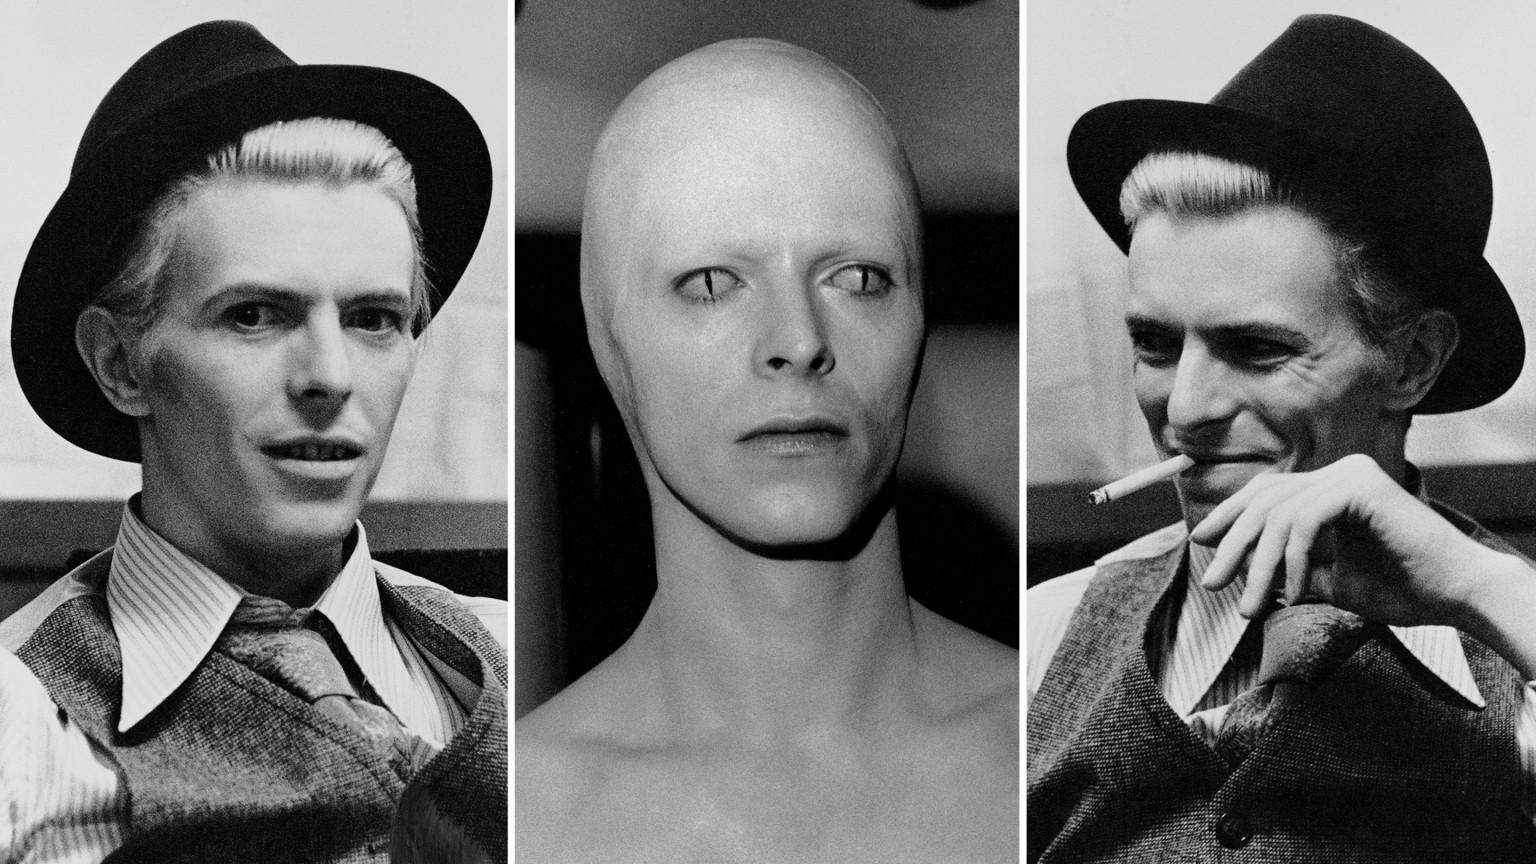 David Bowie's September 1976 Playboy Interview